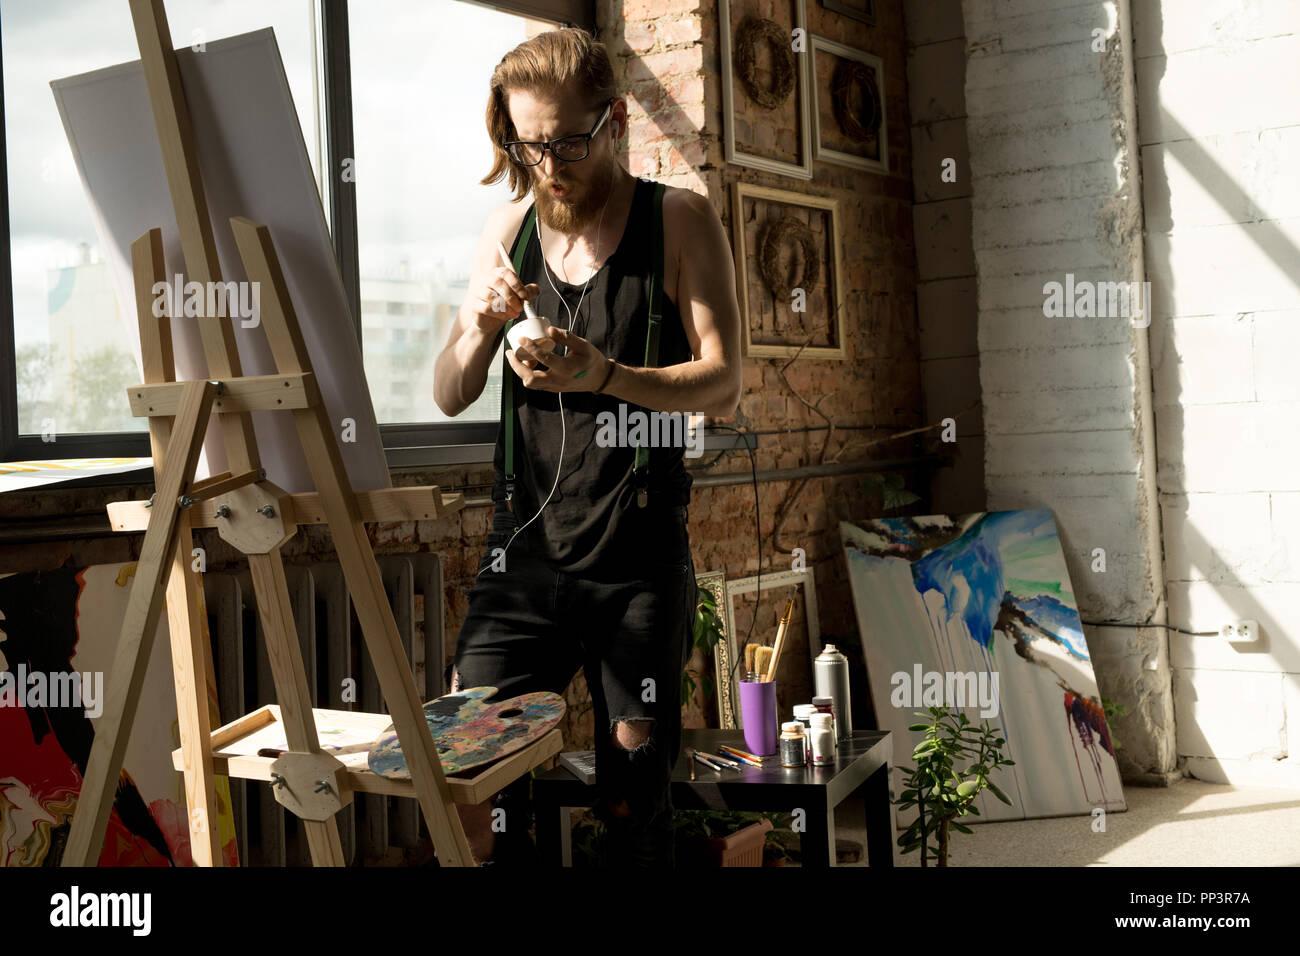 En el taller del artista moderno Imagen De Stock